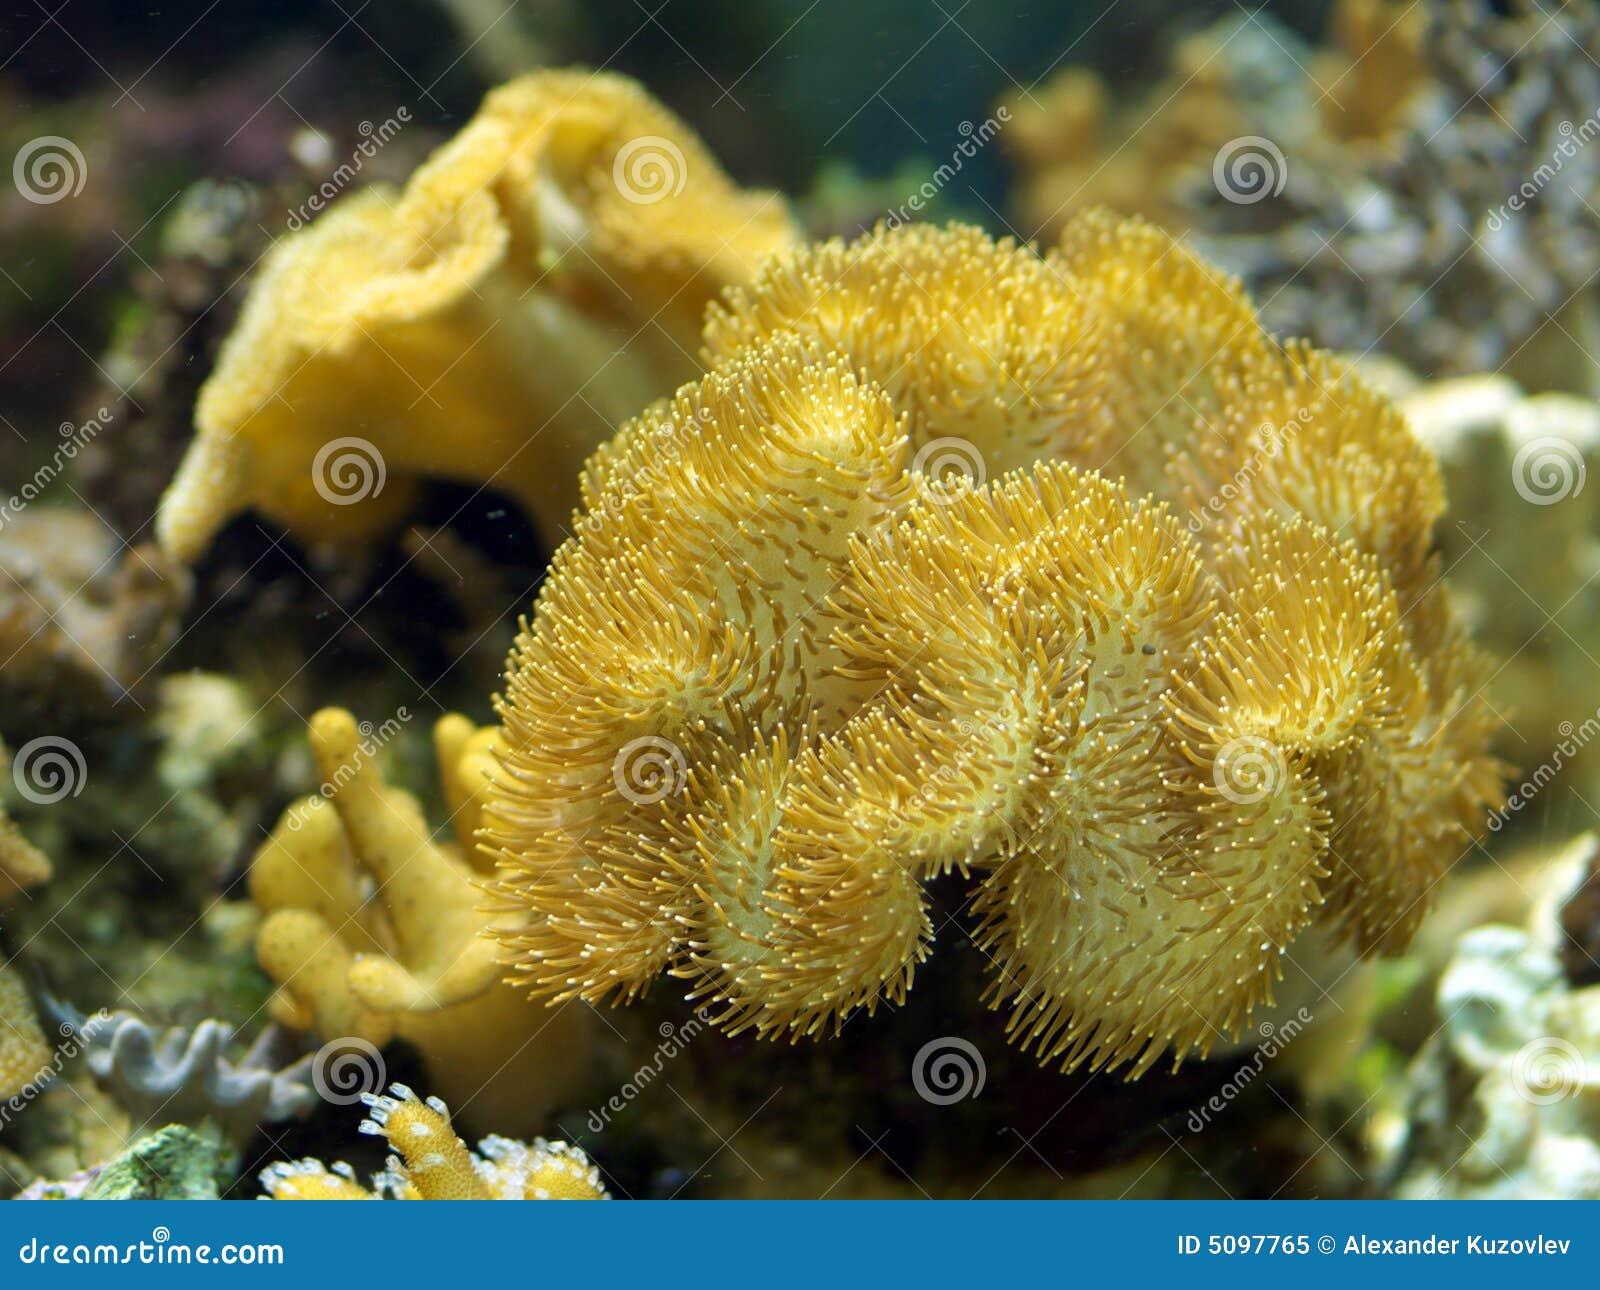 plante aquatique dans l 39 aquarium image stock image 5097765. Black Bedroom Furniture Sets. Home Design Ideas